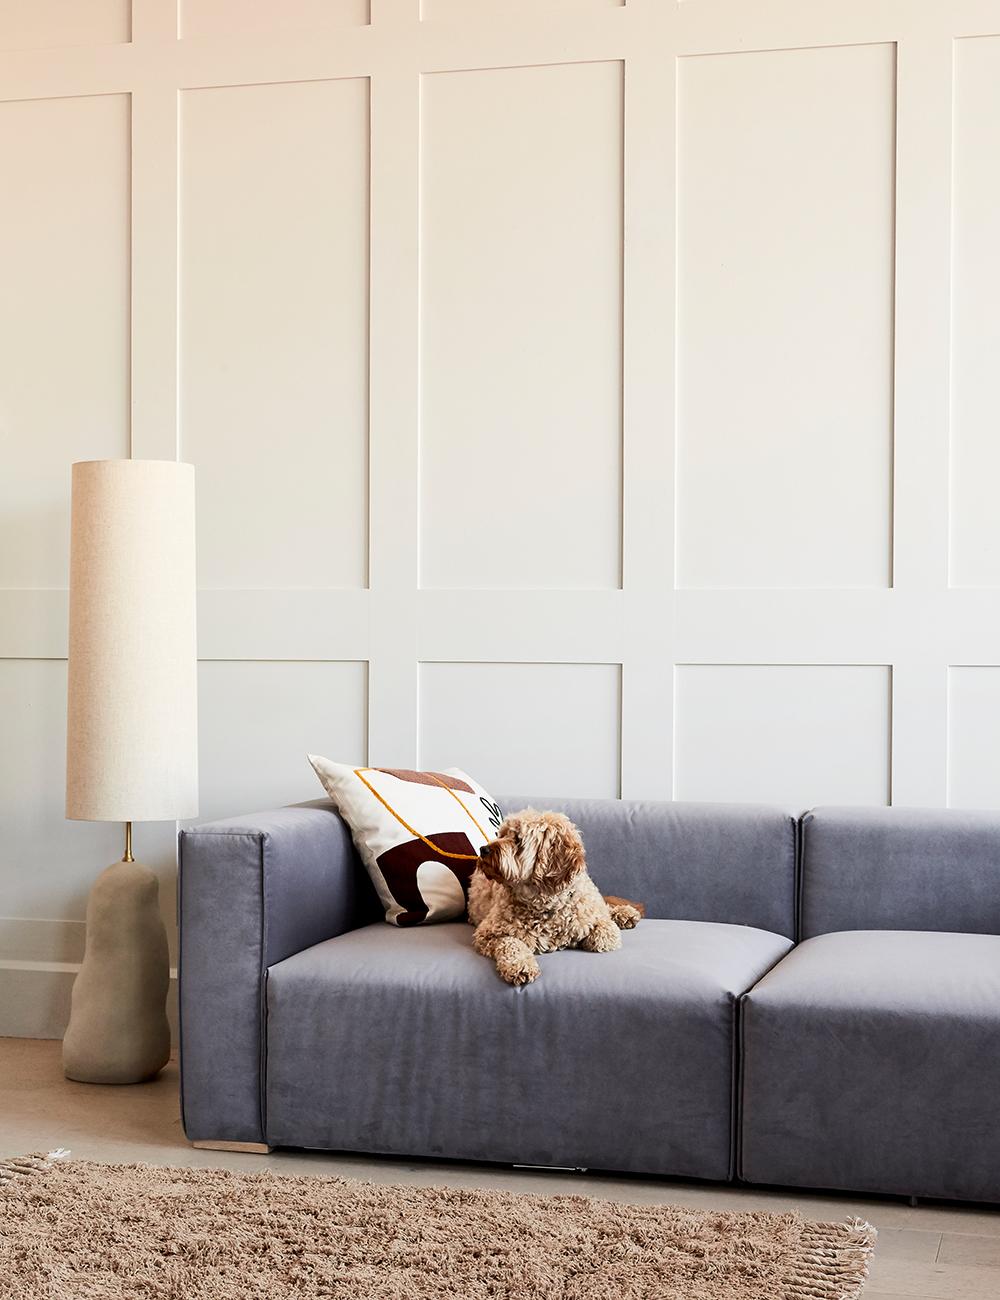 Read: How to Choose a Pet Friendly Sofa